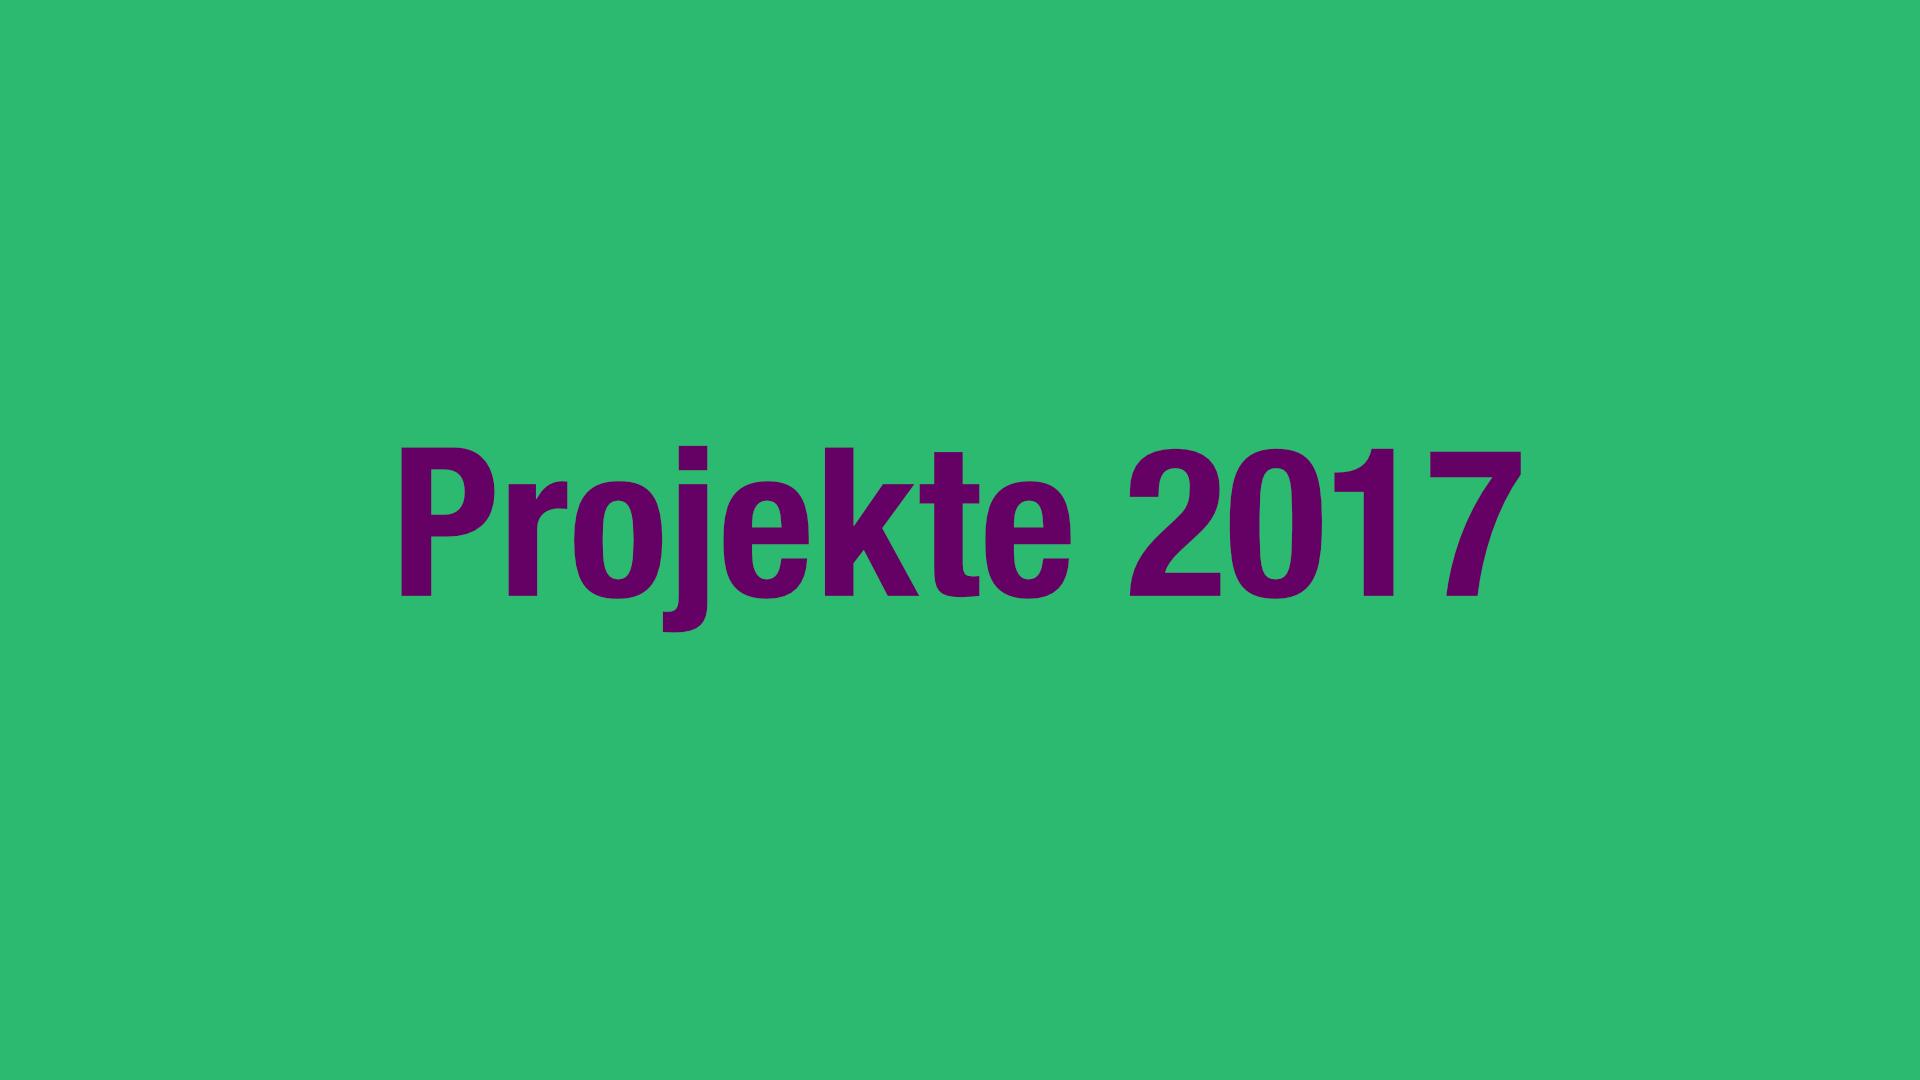 Projekte 2017